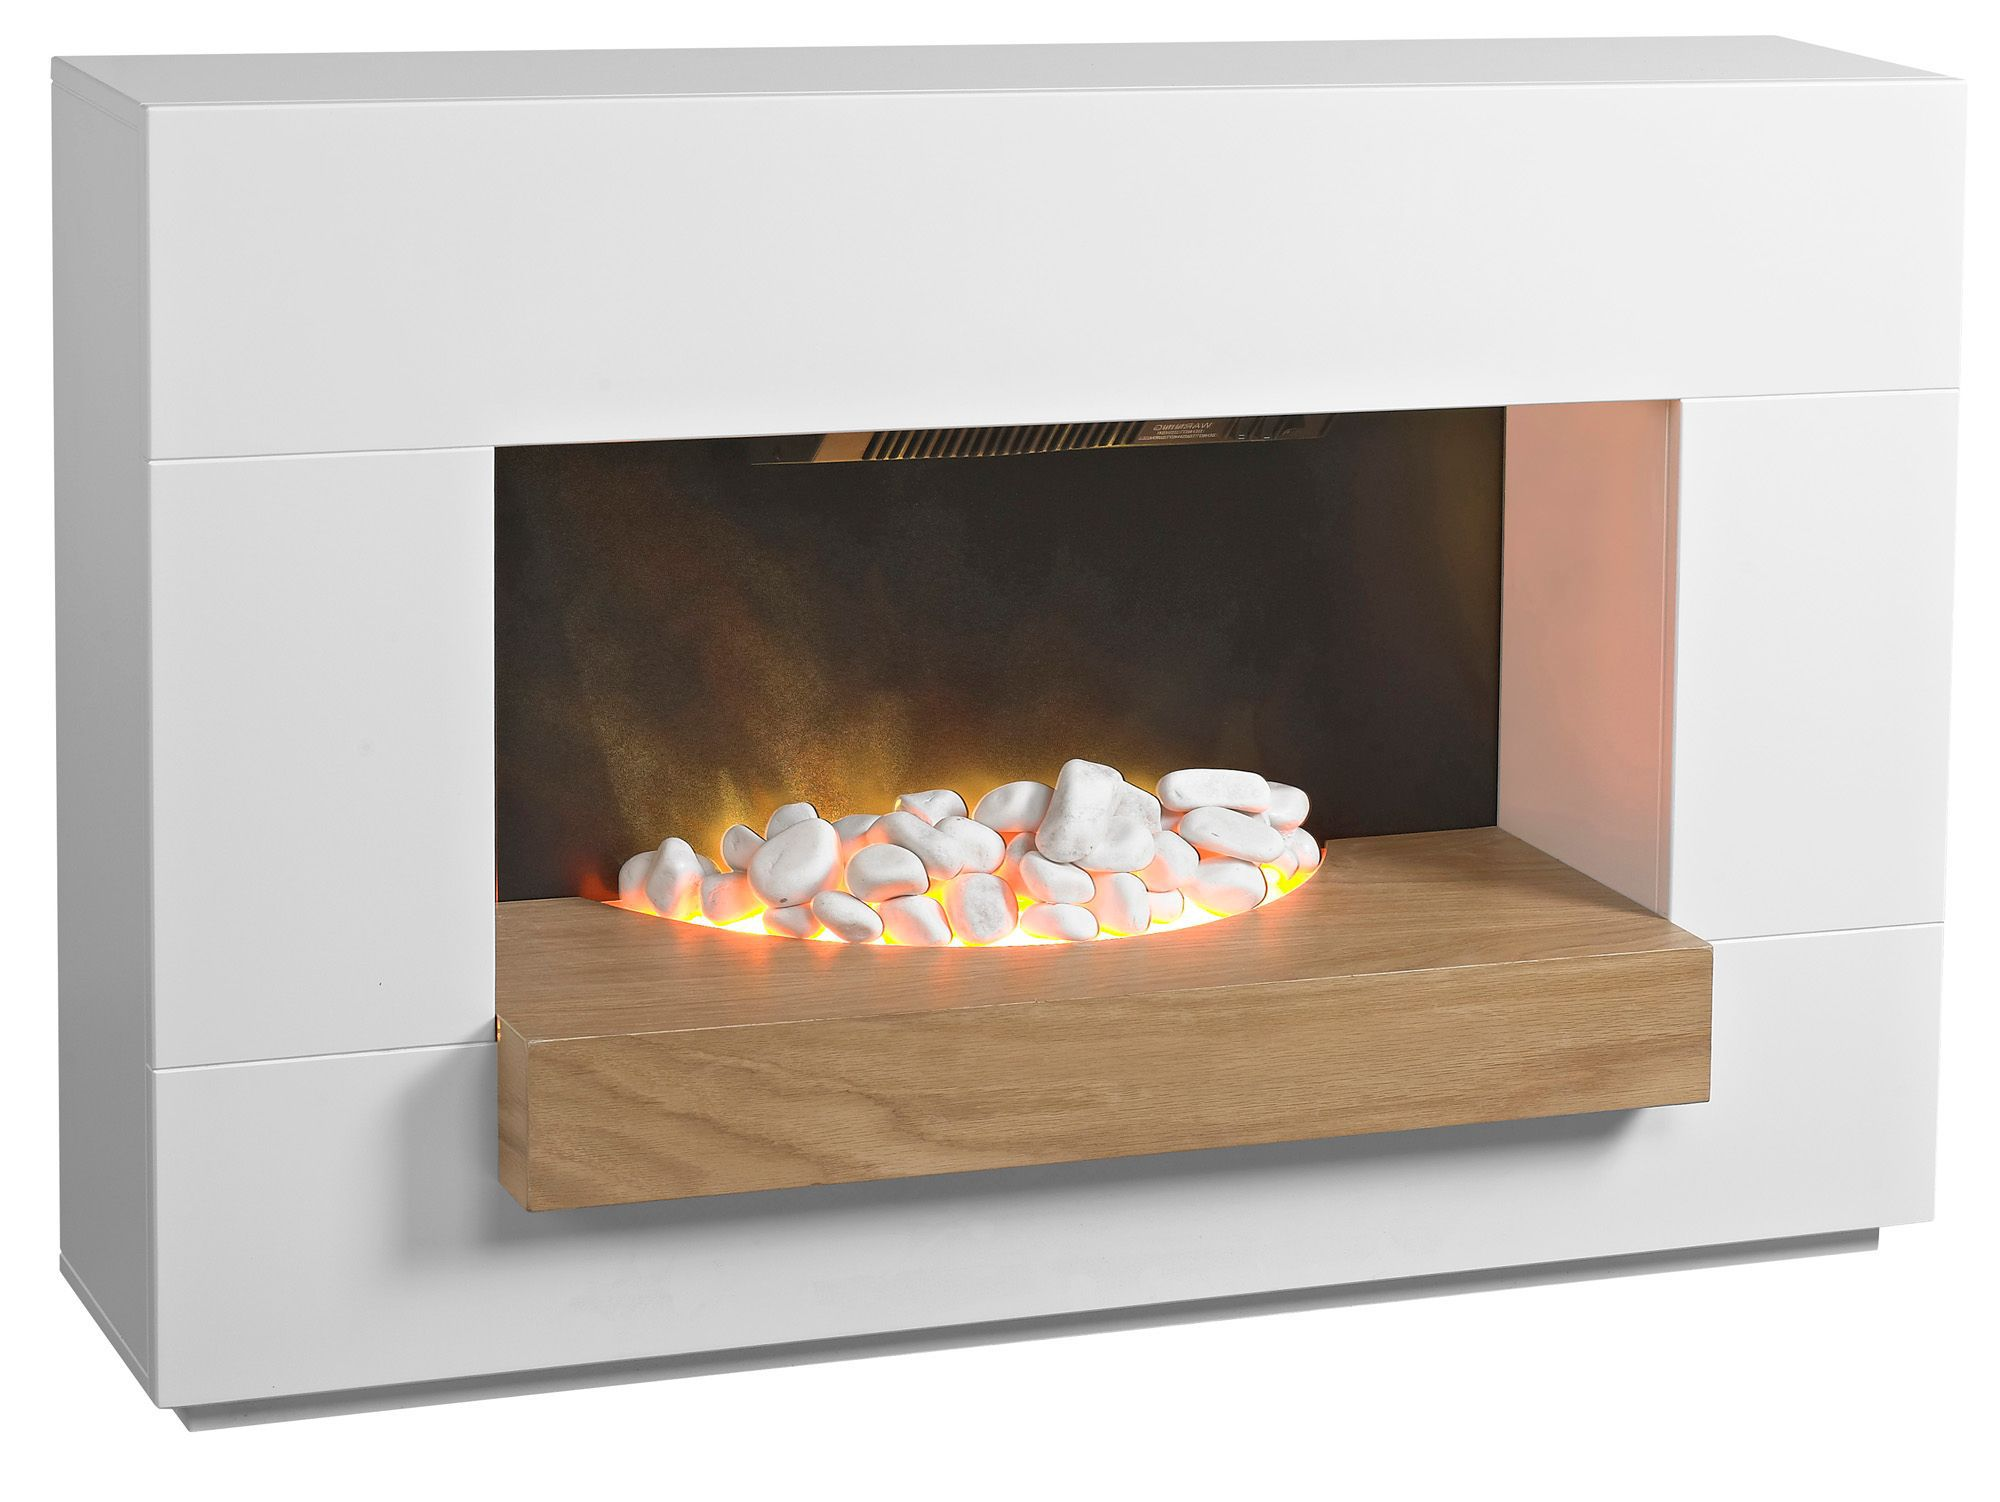 mini kitchen appliances hgtv remodel blyss carlisle electric fire suite | departments diy at b&q